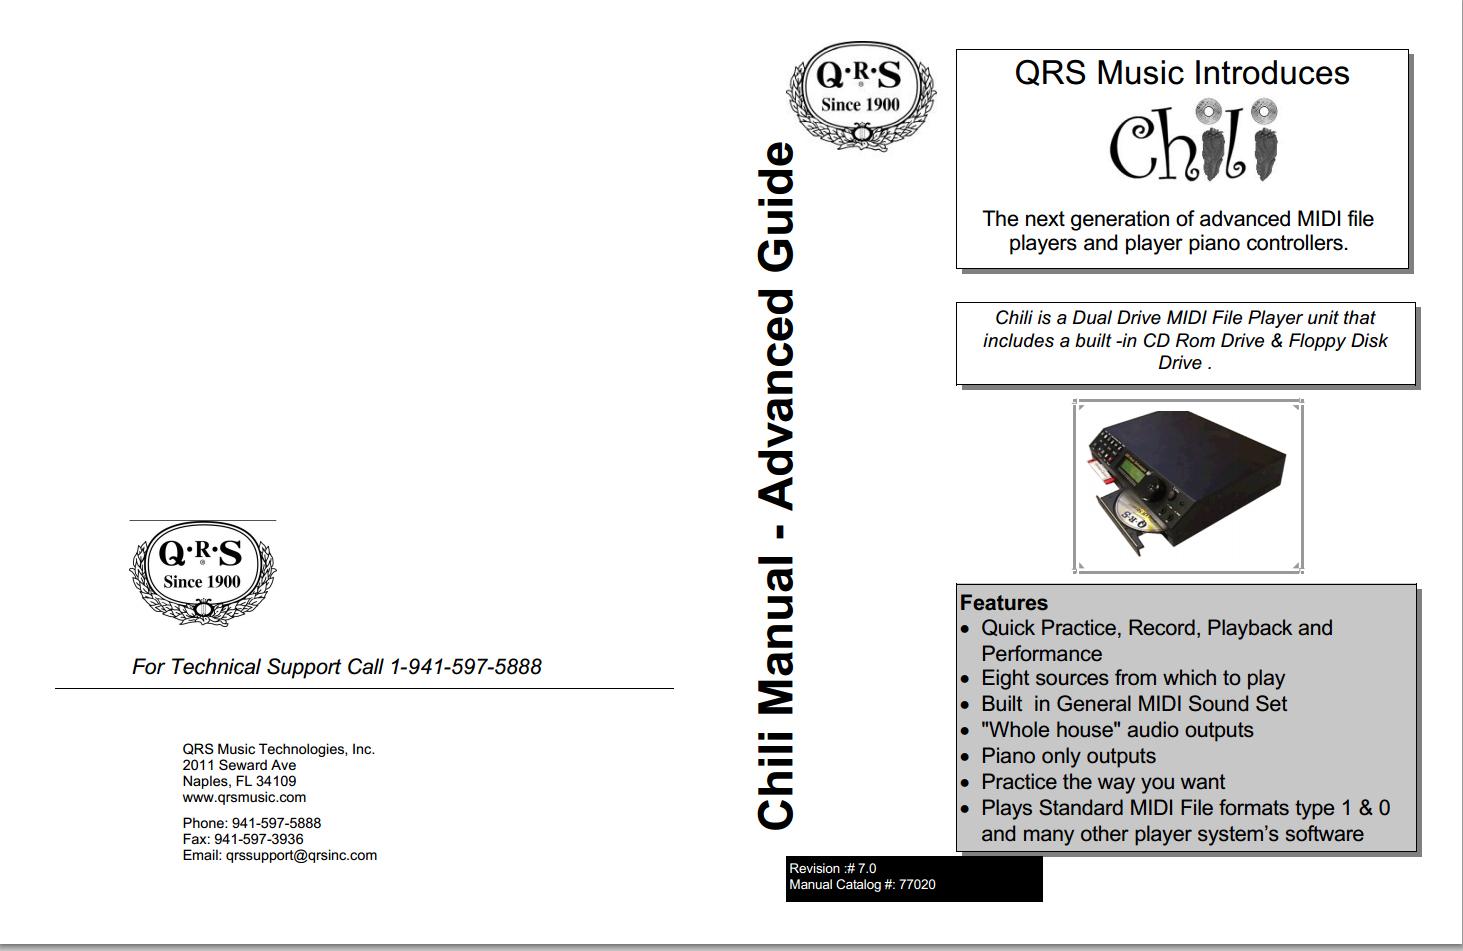 QRS Music Technology Inc